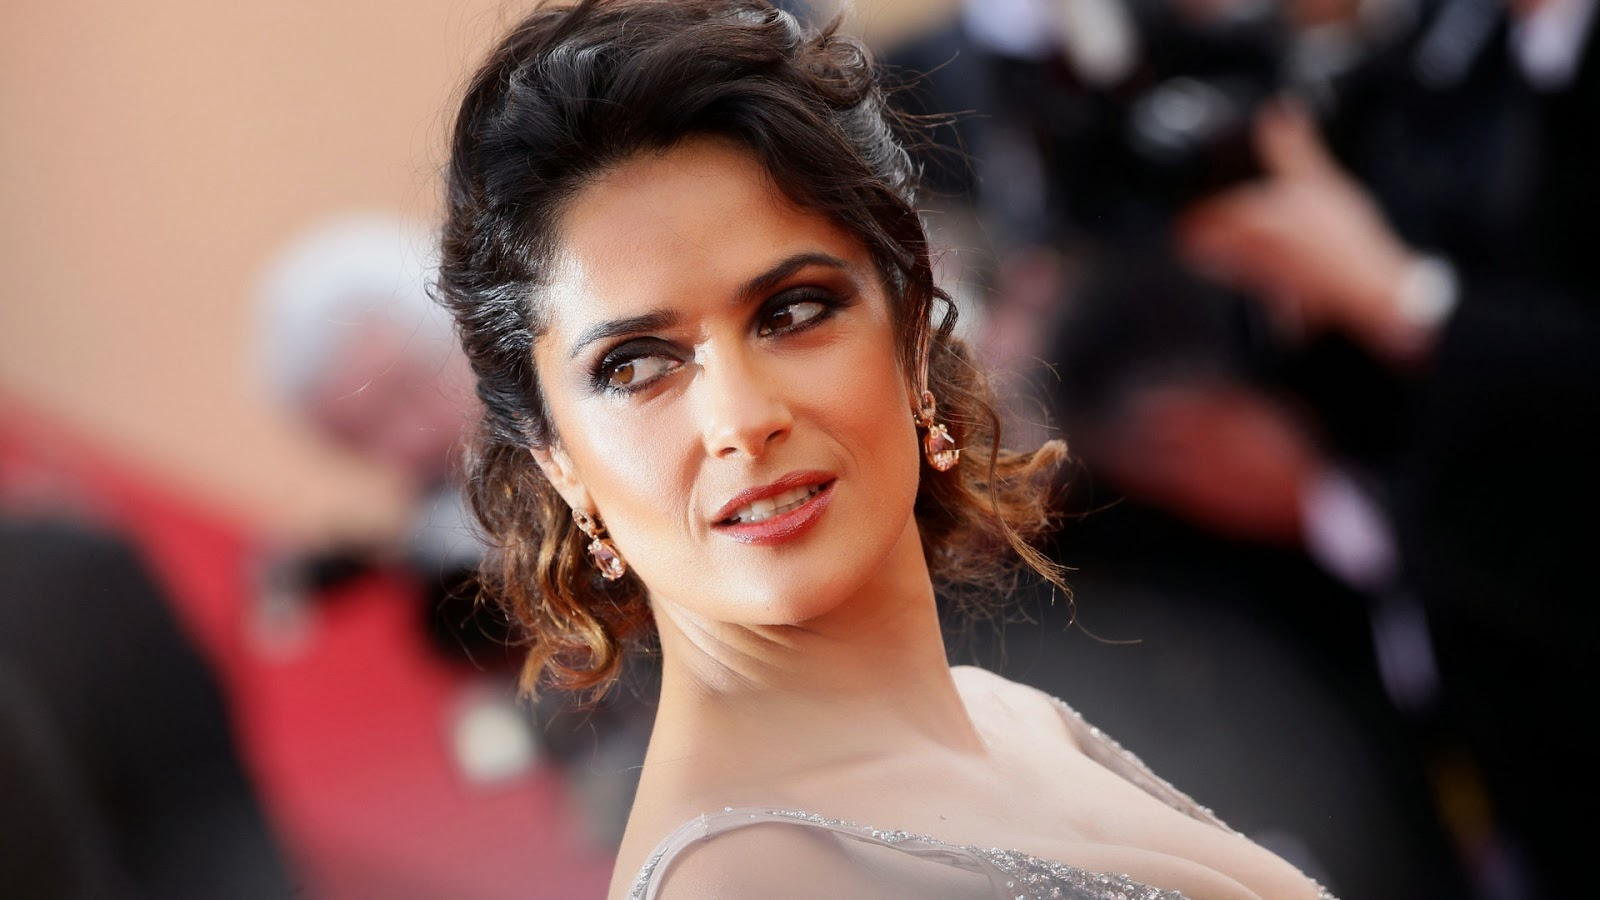 Salma hayek hd wallpapers hd wallpapers - Hollywood actress full hd wallpaper ...